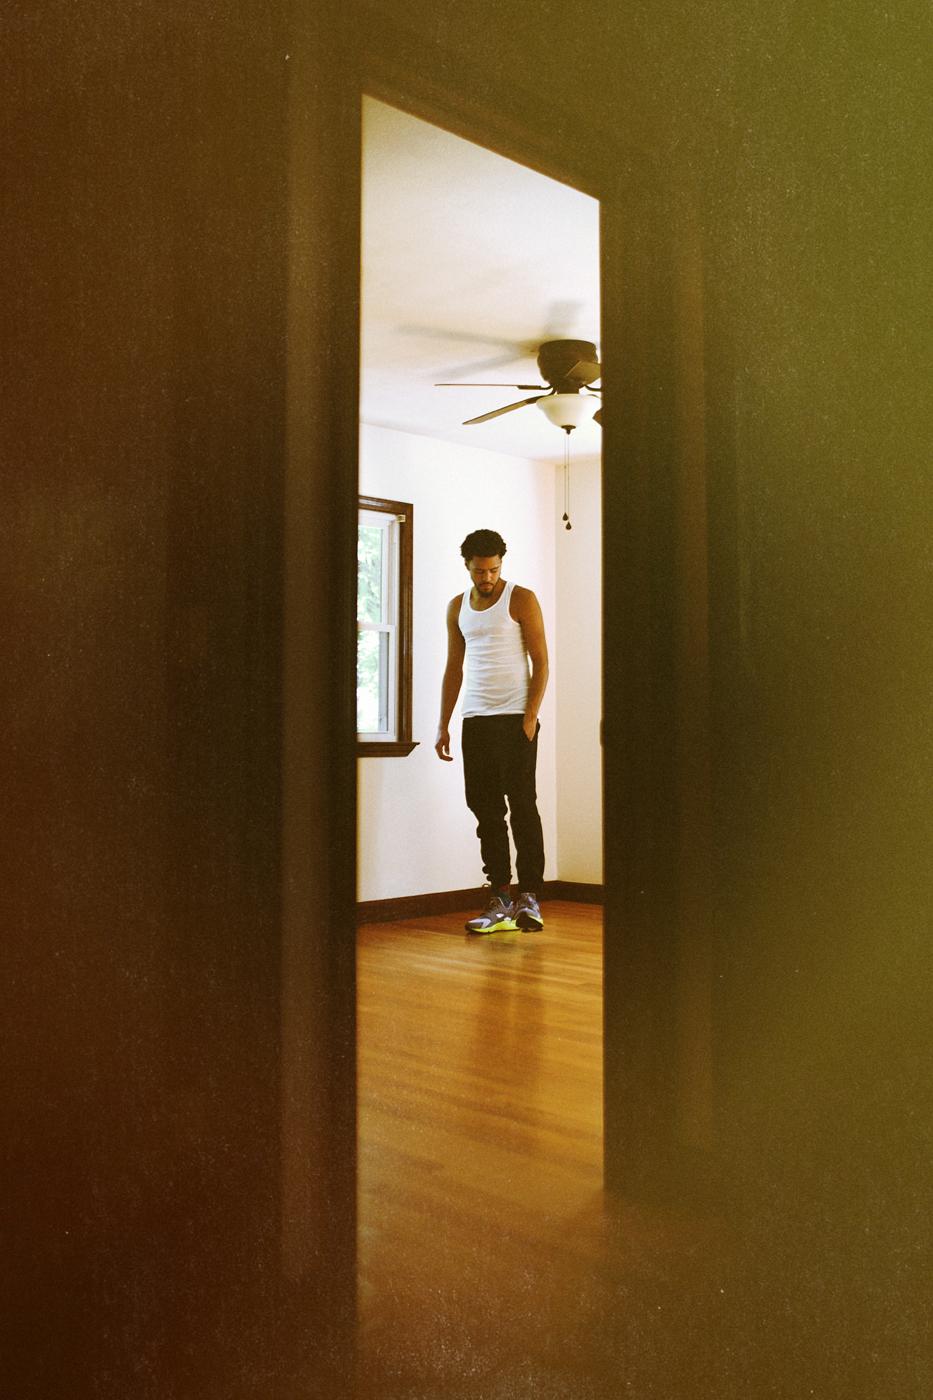 Justin_Hogan-Complex-J_Cole-4.jpg